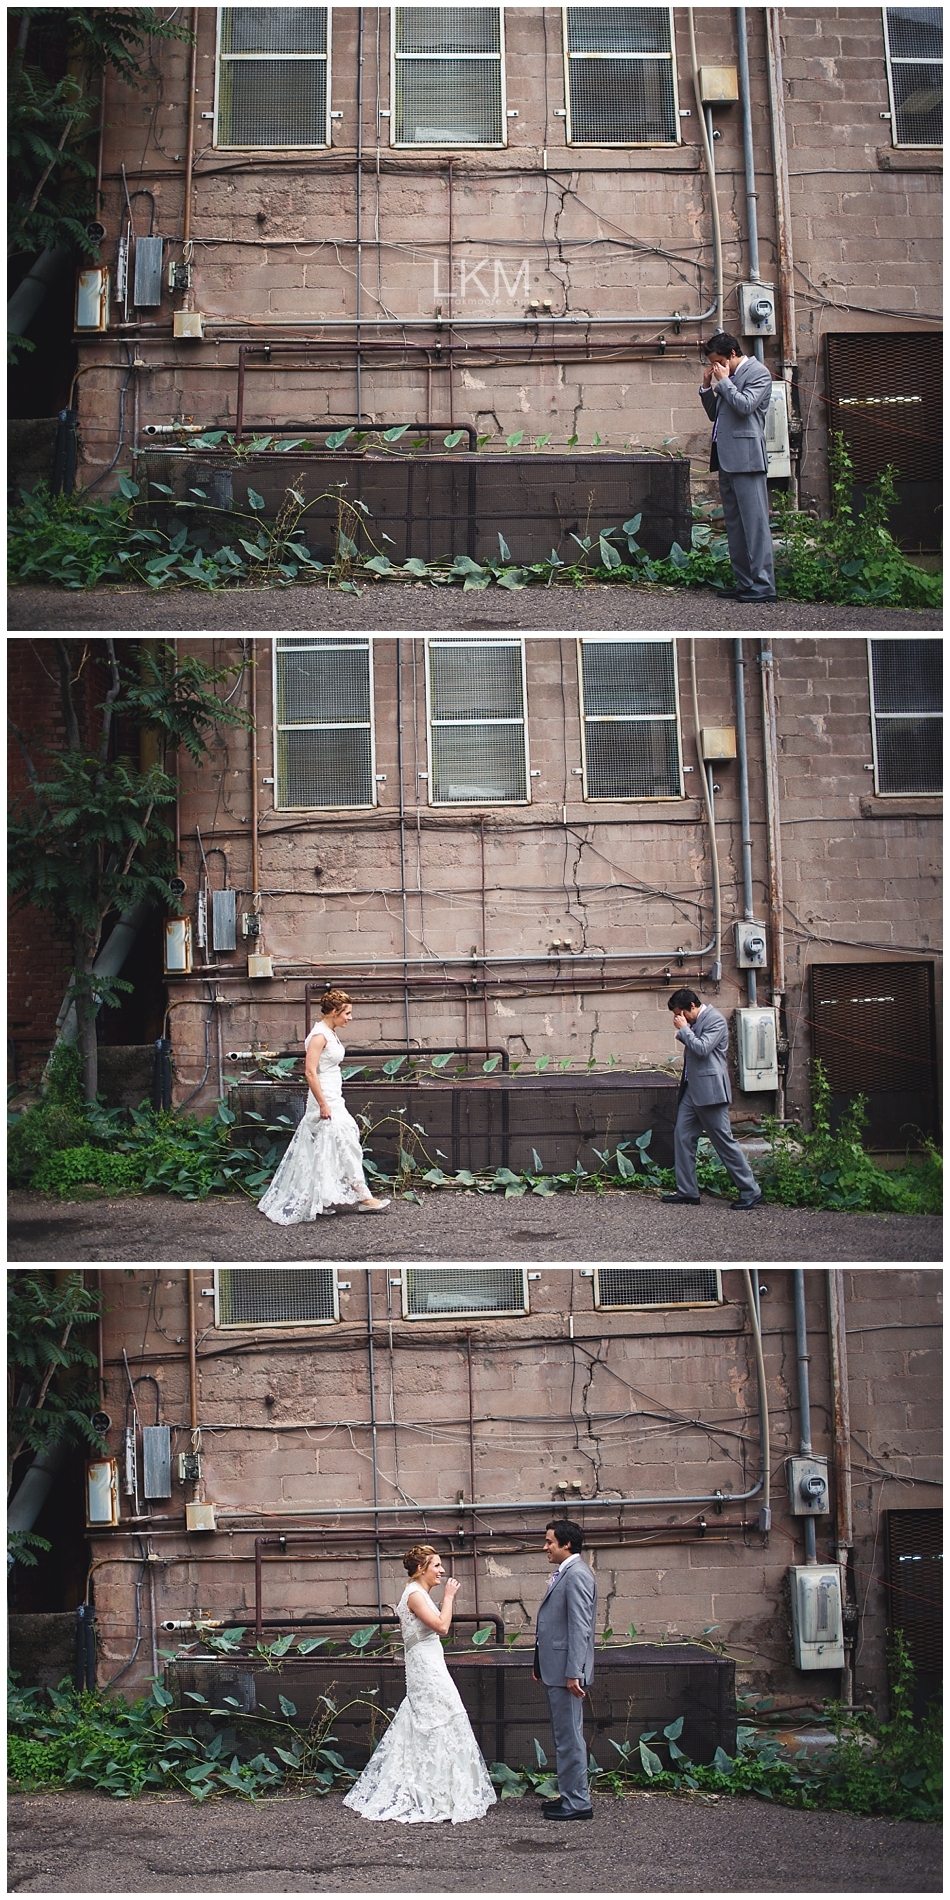 bisbee-arizona-vintage-wedding-photographer-hosterman_0029.jpg